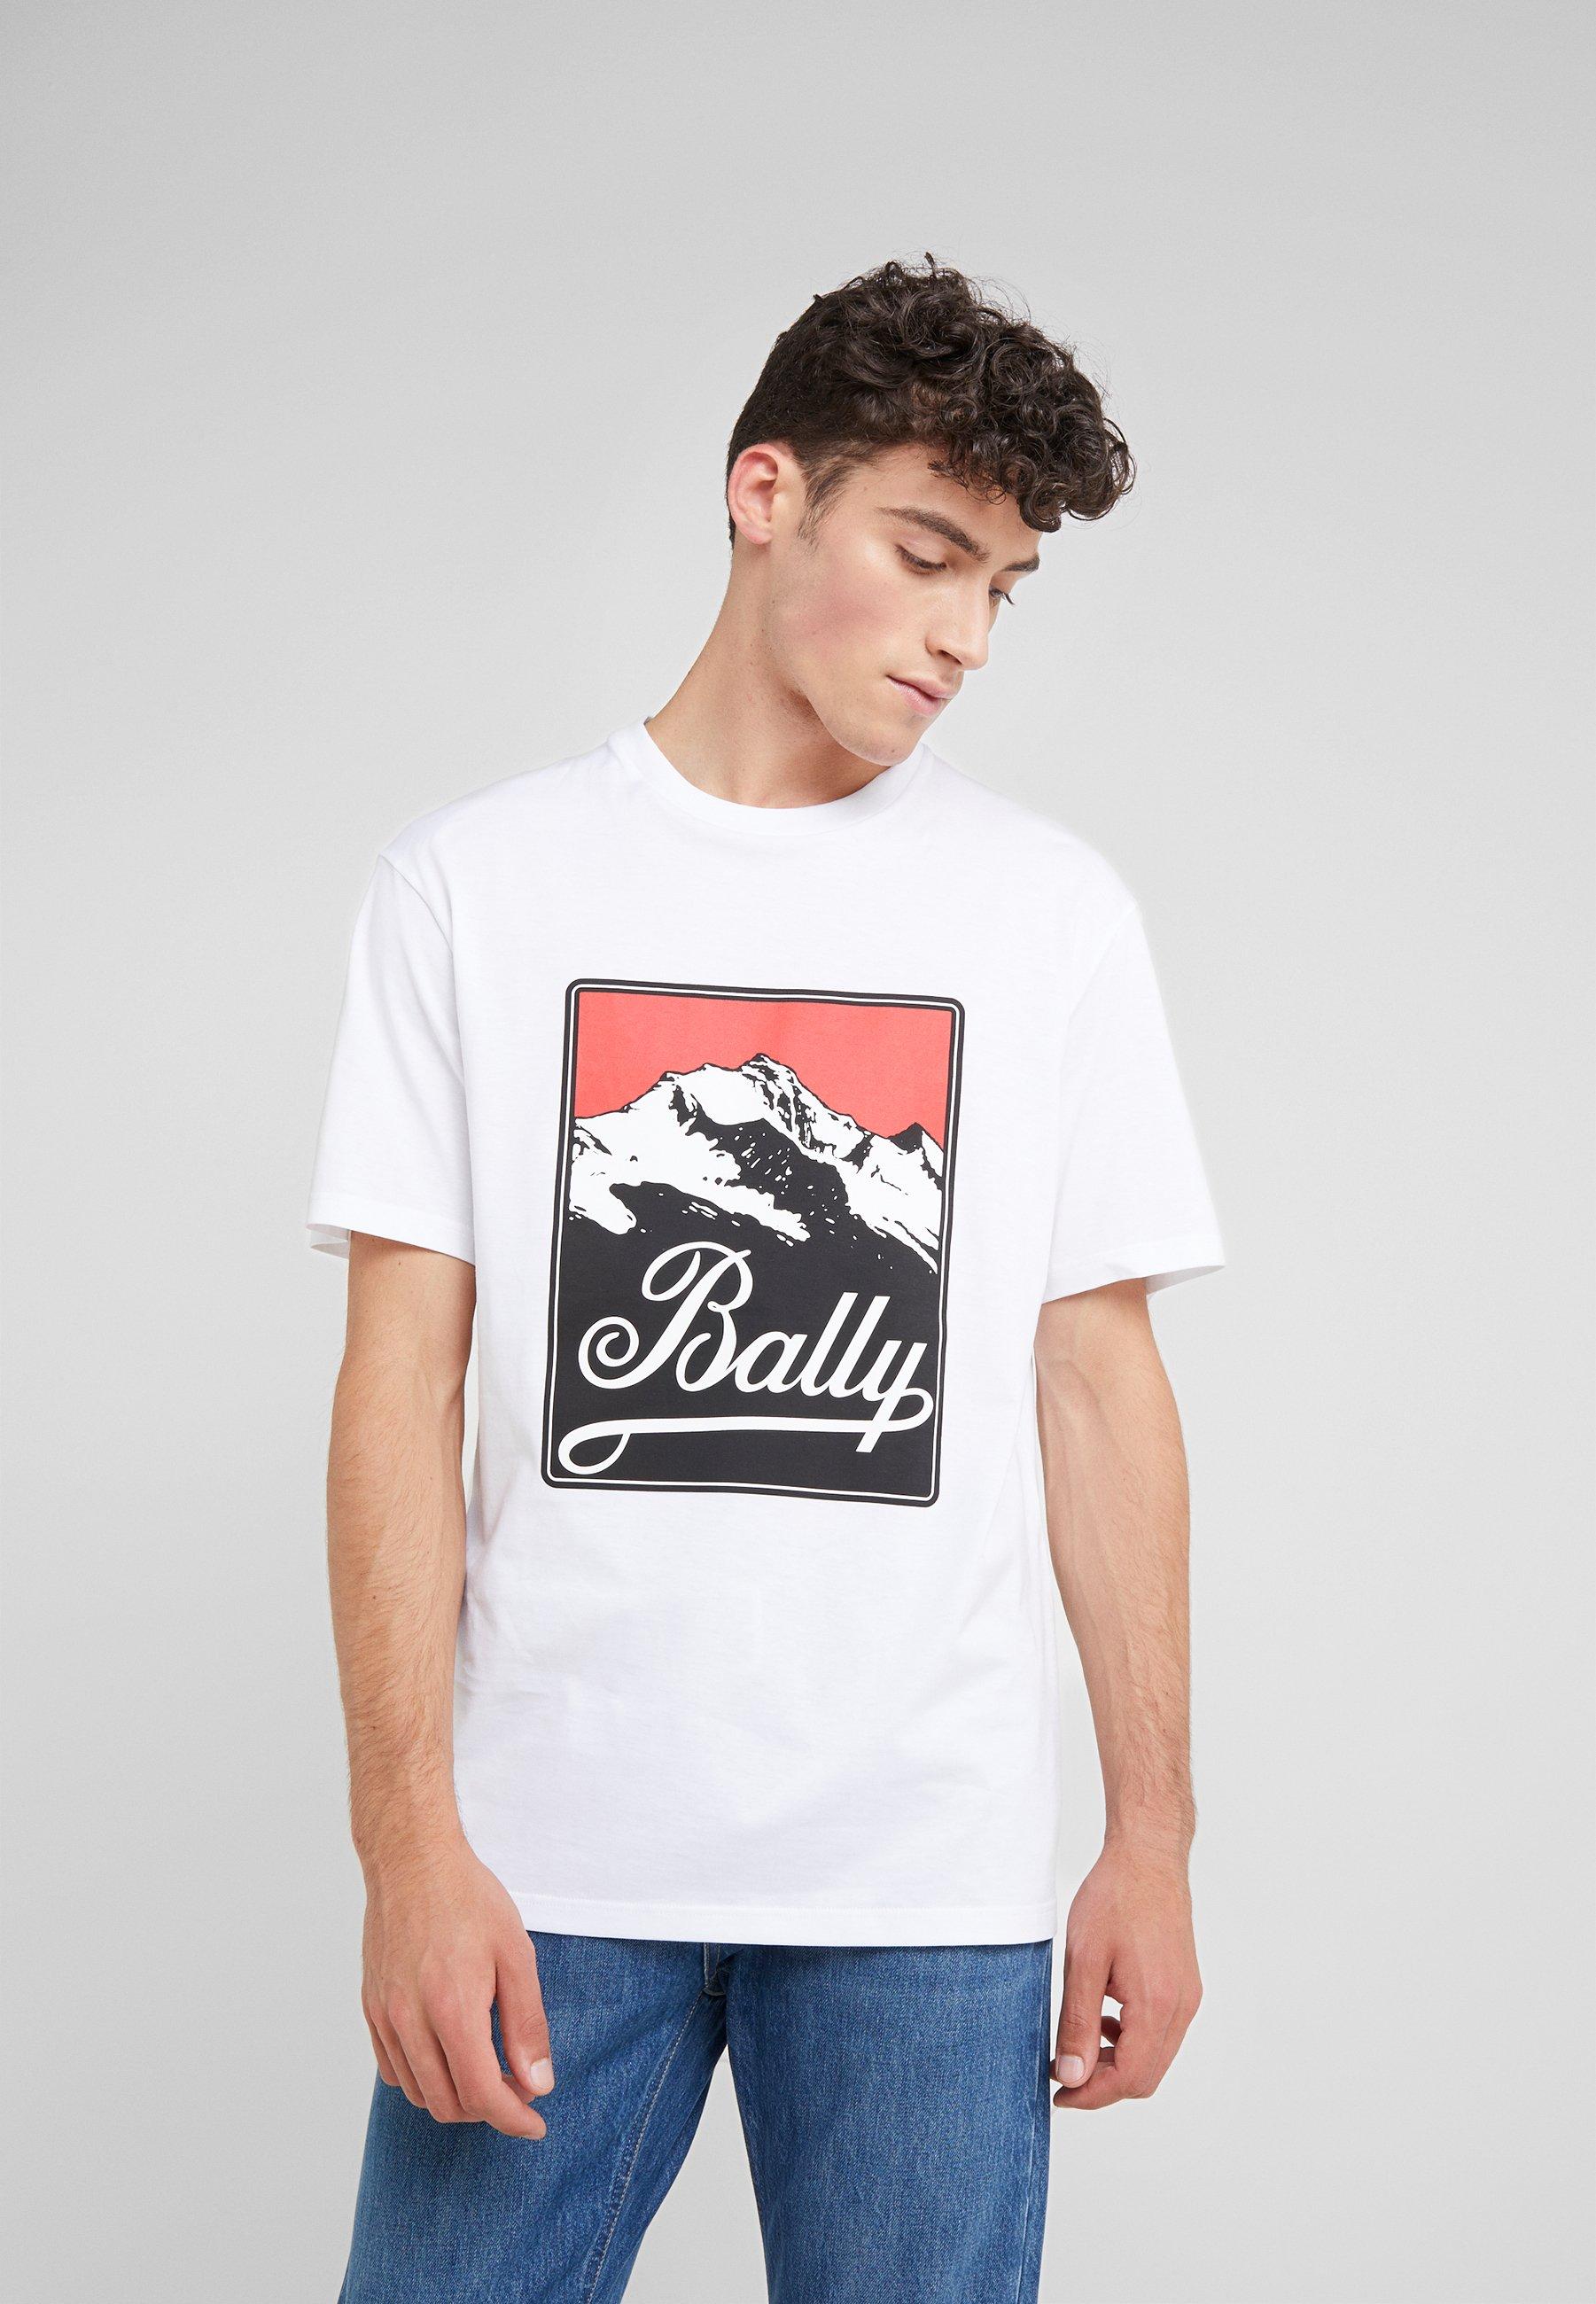 shirt Bally ImpriméWhite shirt Bally T T Bally ImpriméWhite Bally T T shirt ImpriméWhite qScj354ALR